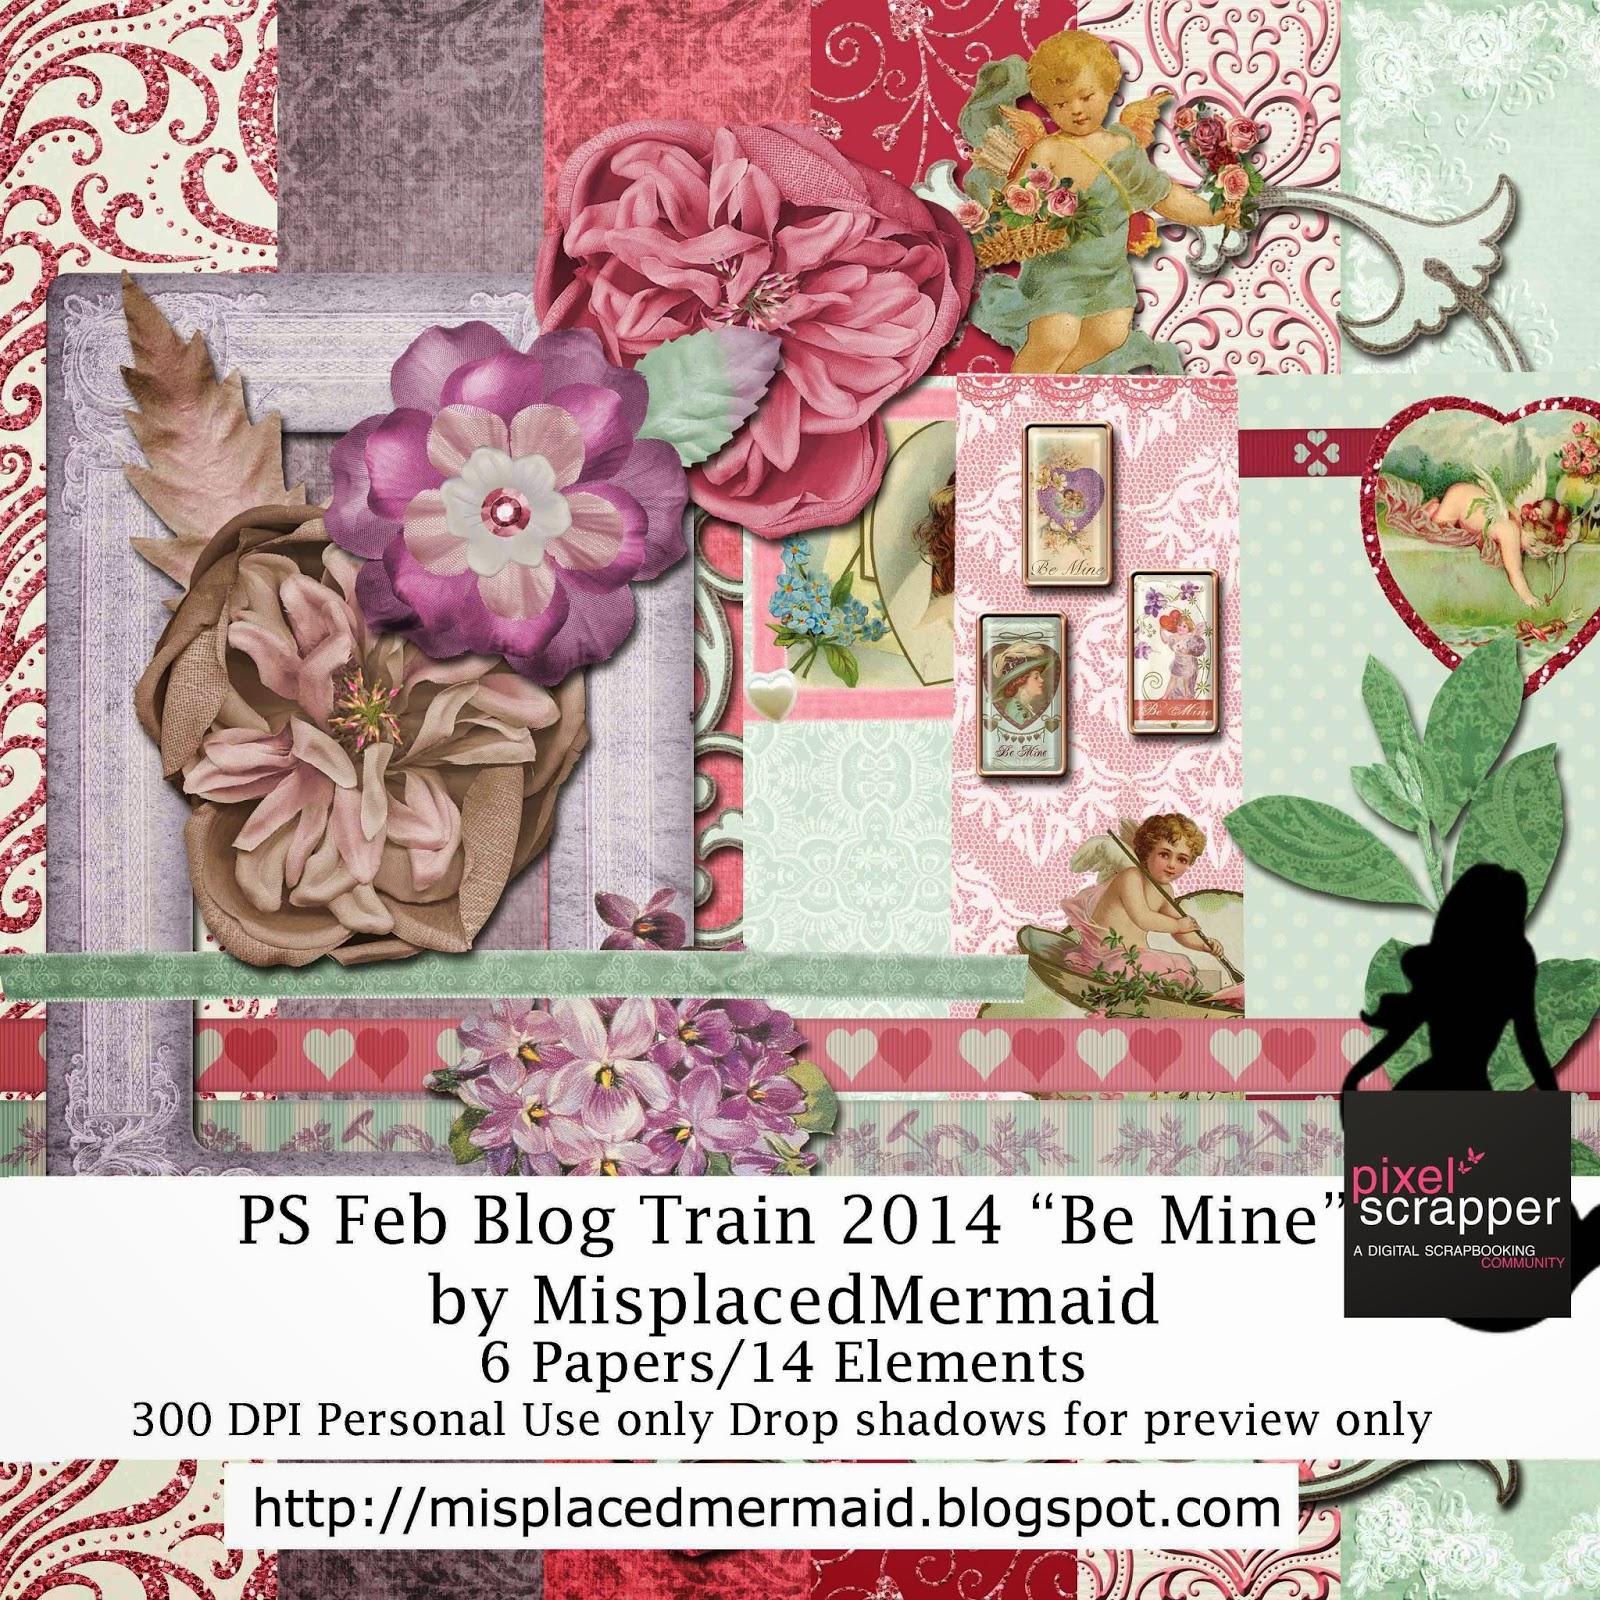 Be Mine-Pixel Scrapper Feb. 2014 Blog Train